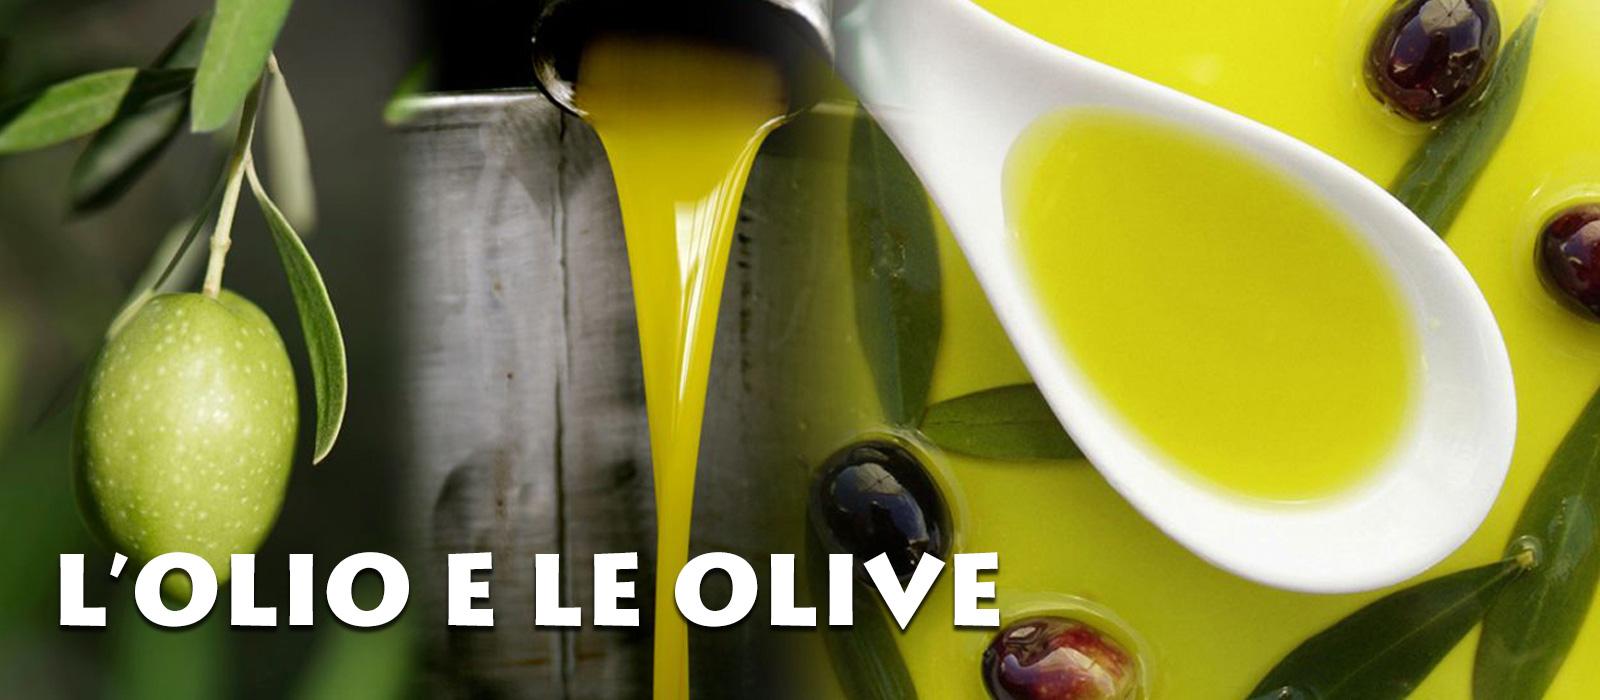 lolio-e-le-olive-1600x700-1